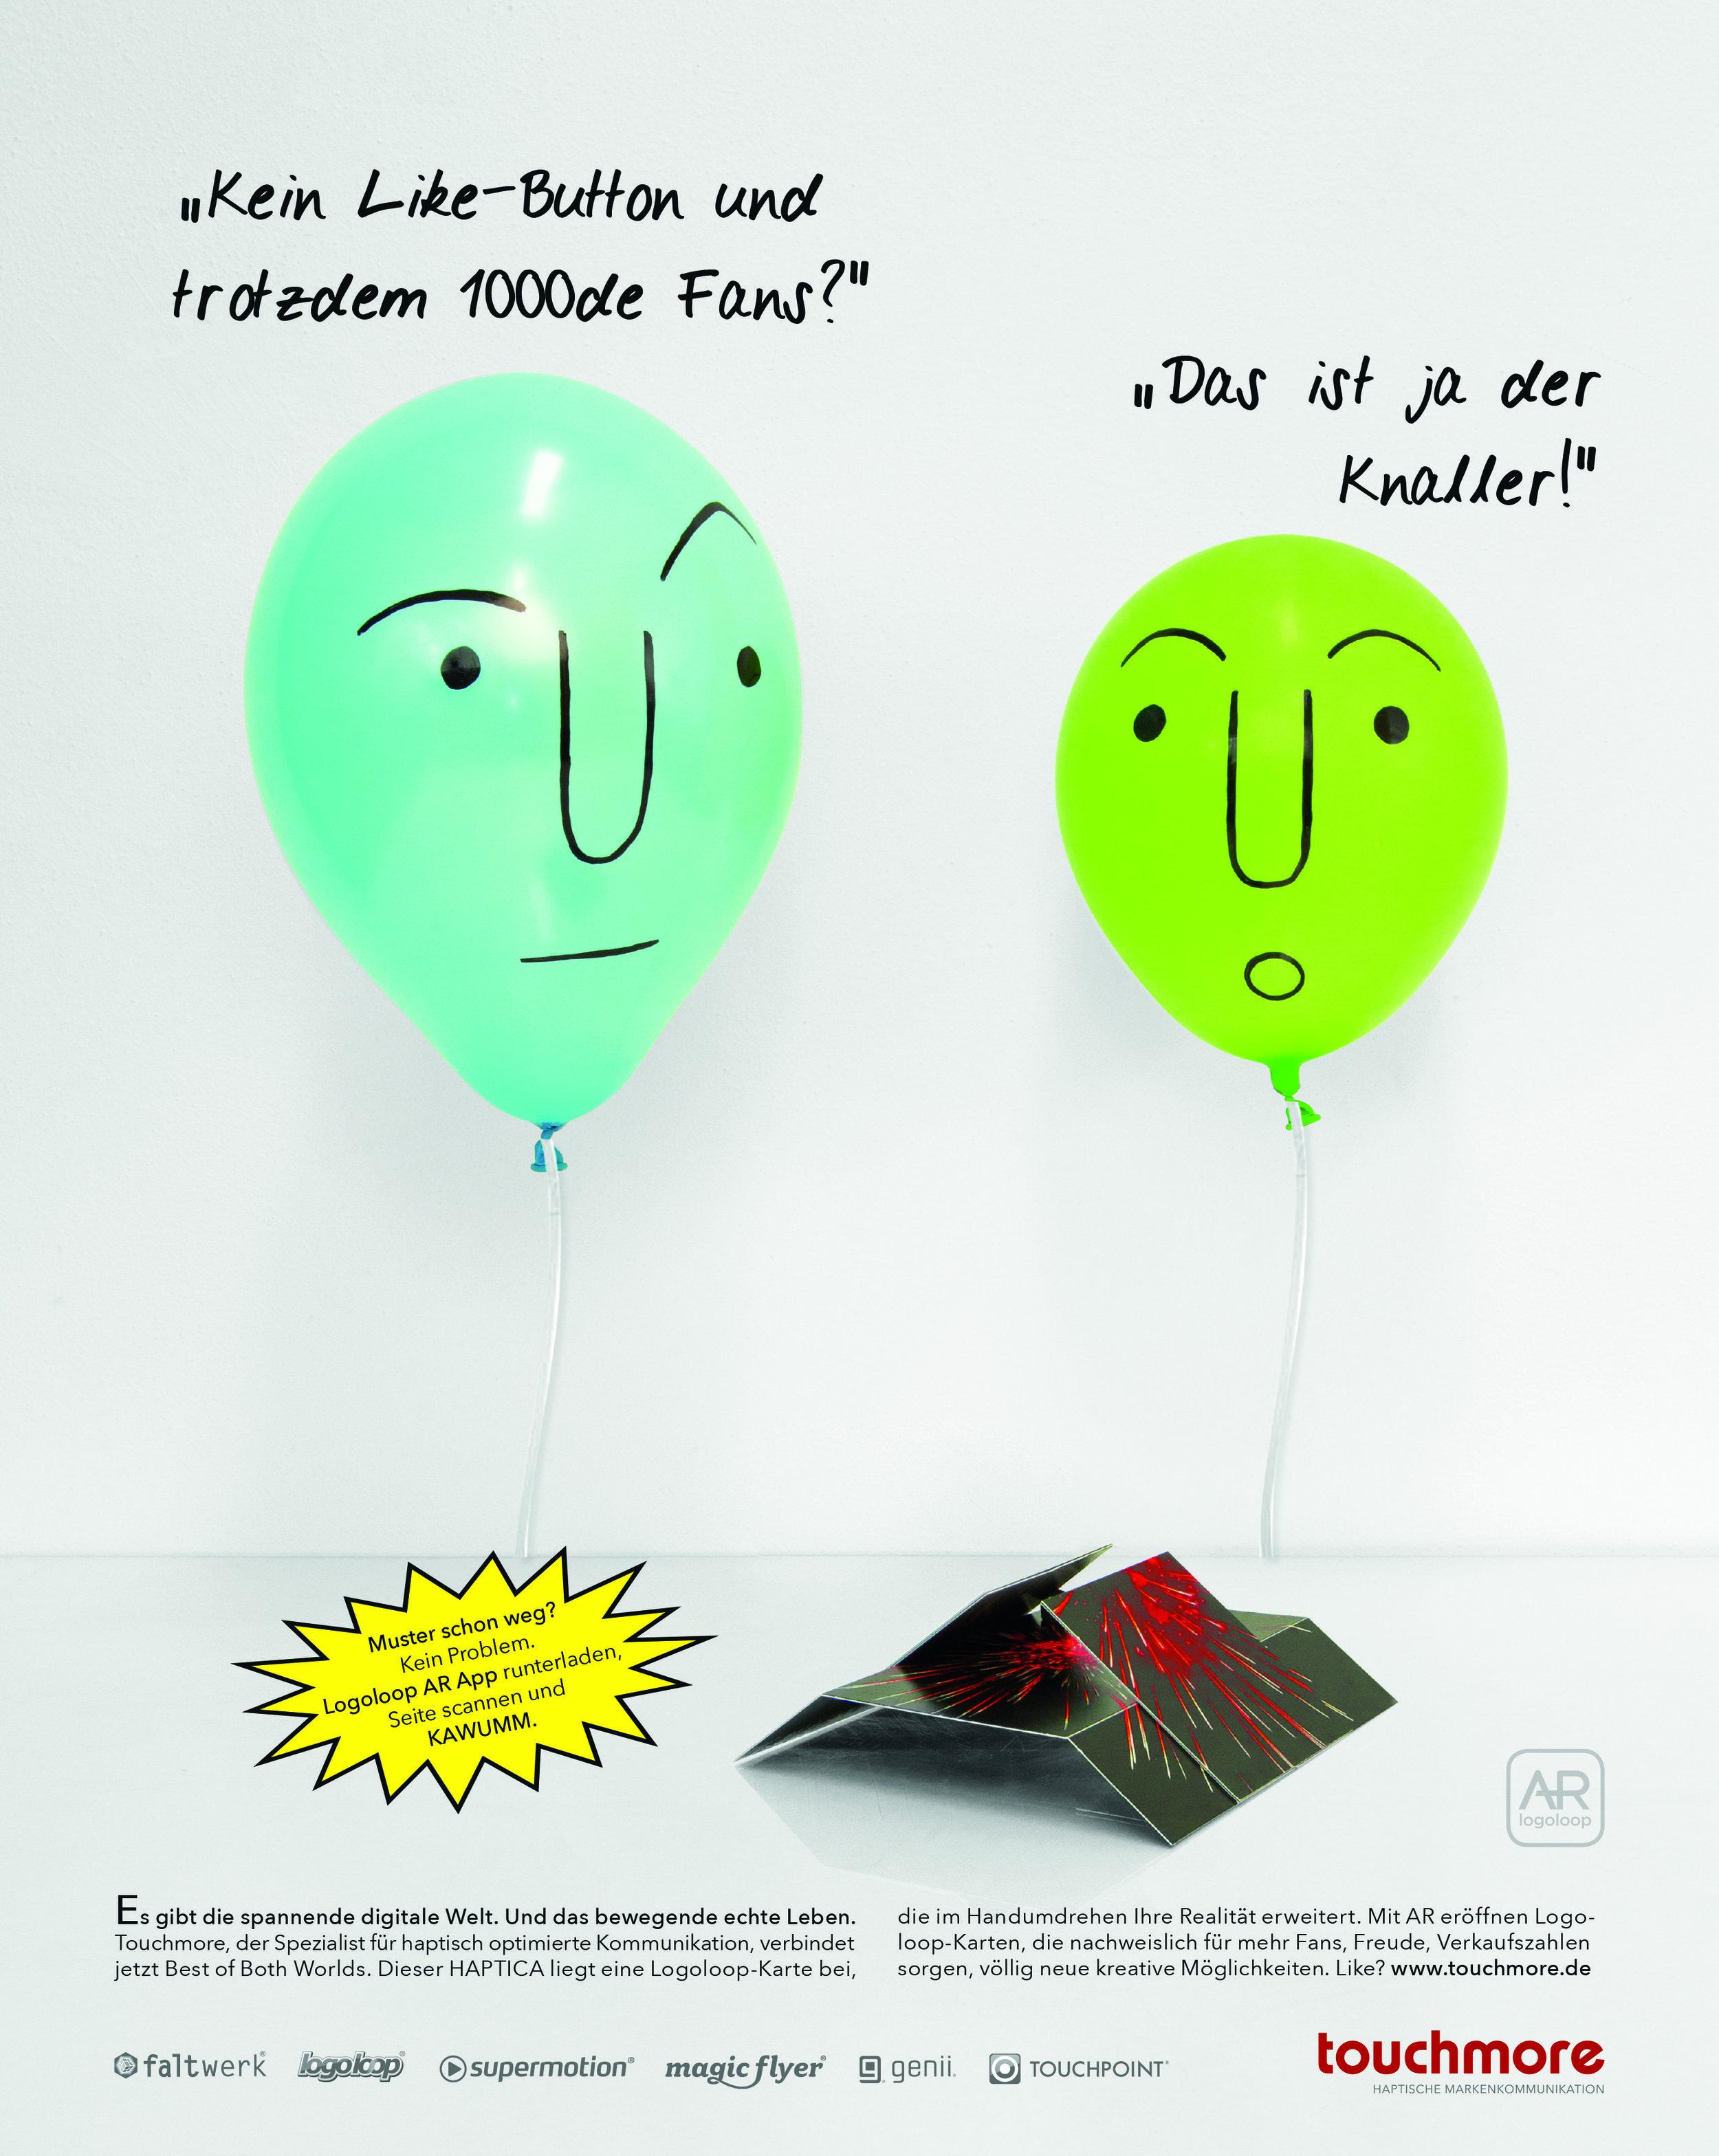 Touchmore_Ballons.jpg